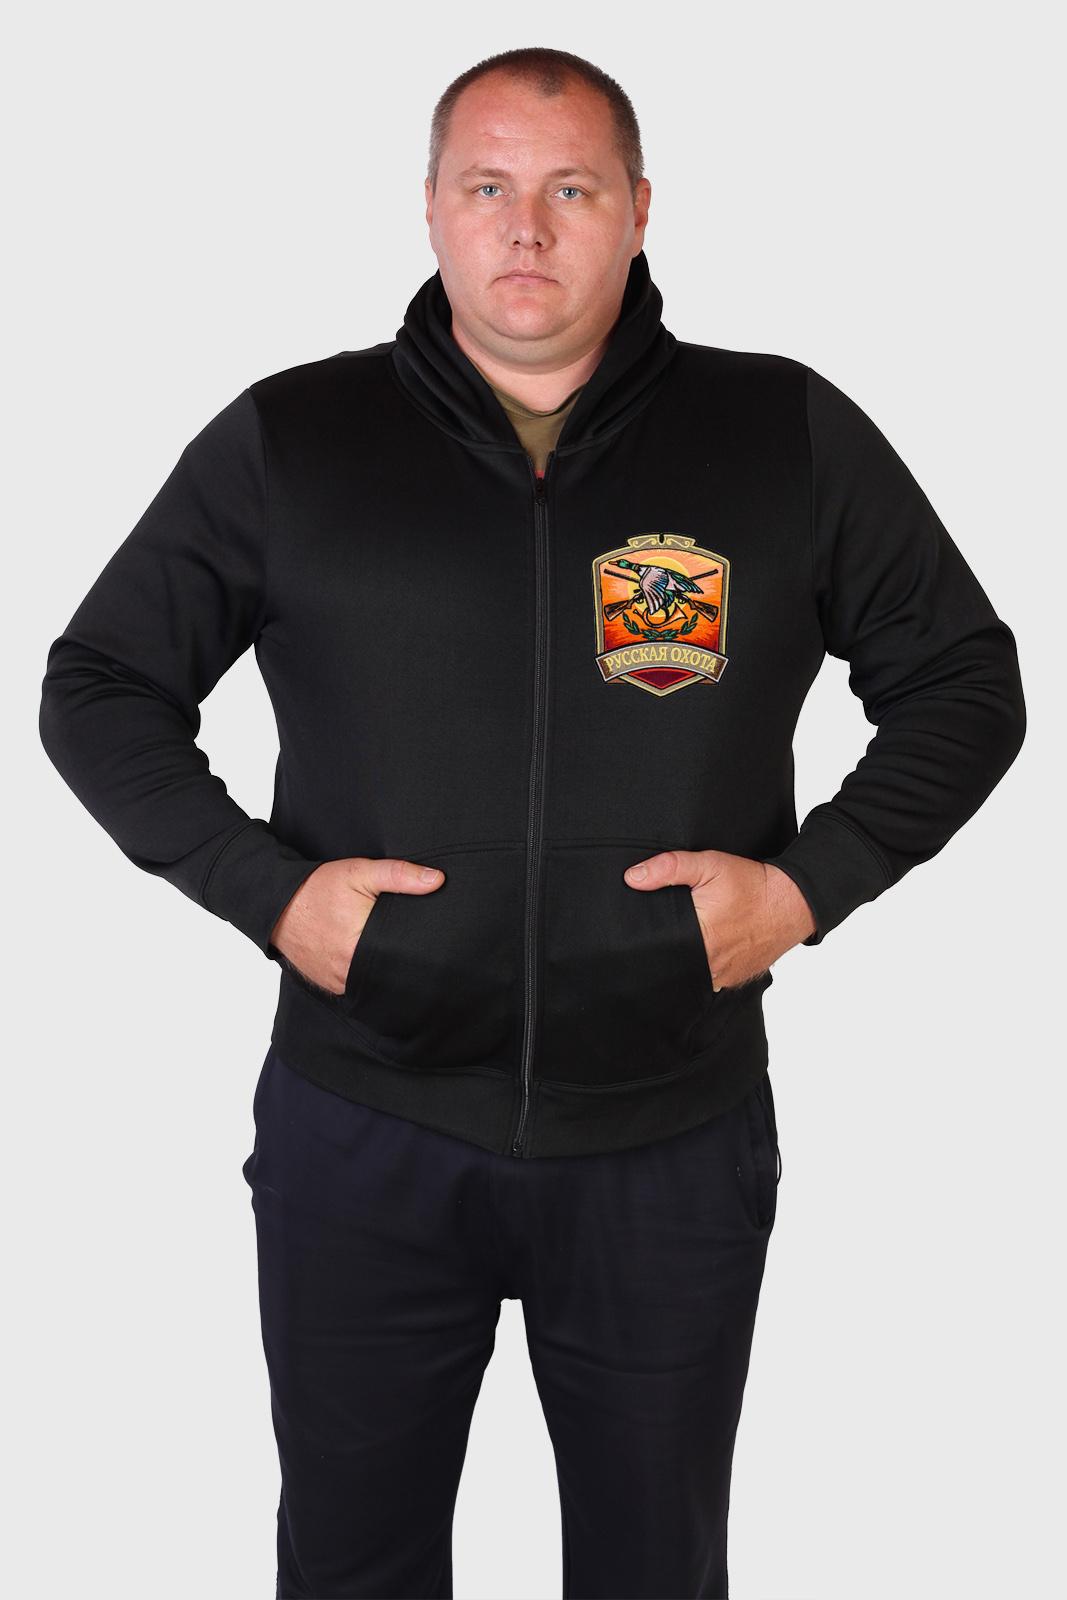 Мужская толстовка с вышивкой Русская Охота